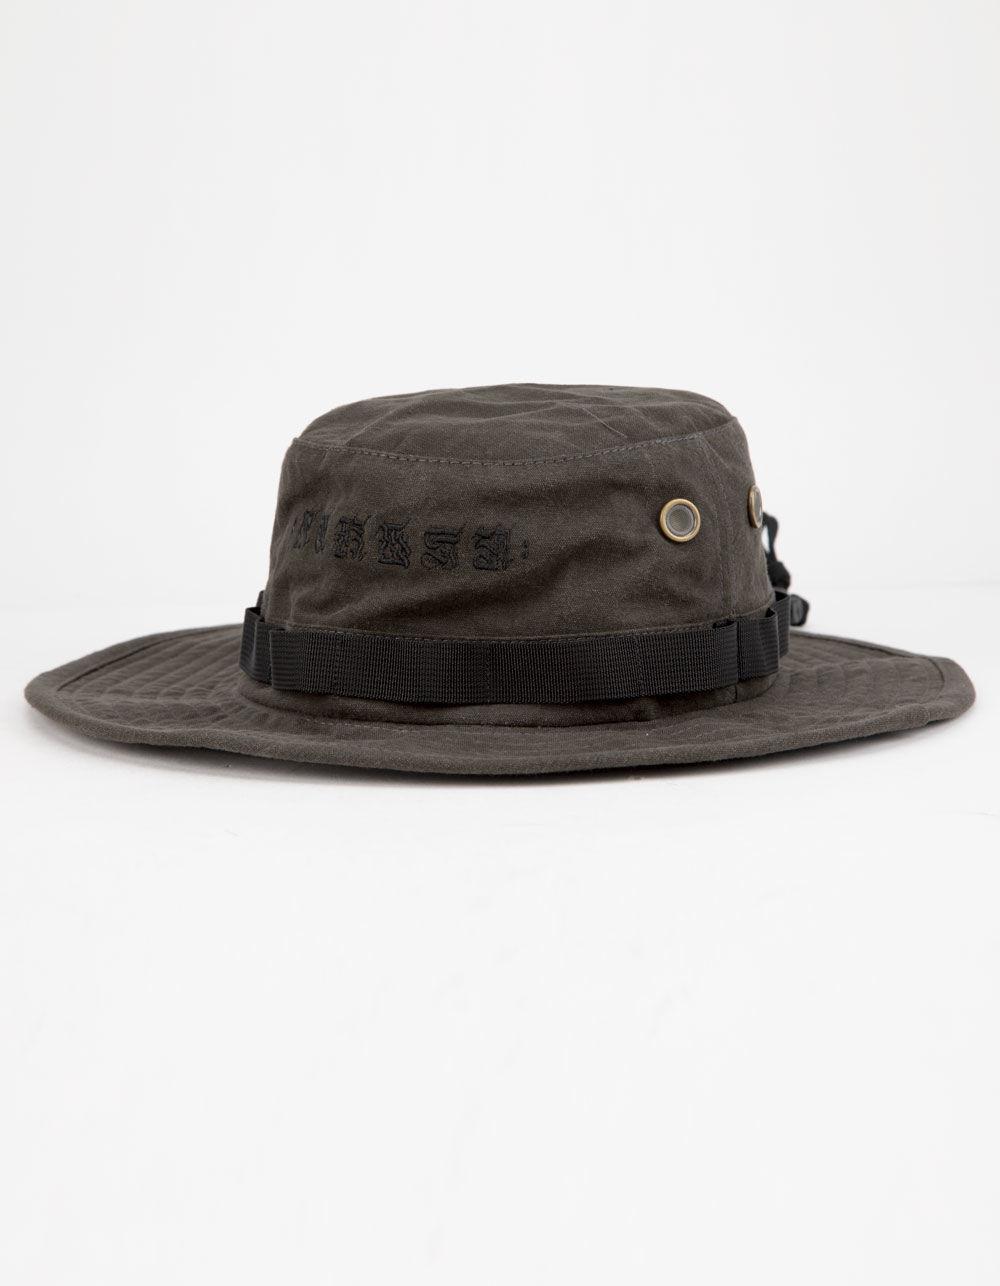 58d96d47c38 Lyst - Hurley Cryptik Mana Mens Bucket Hat in Black for Men